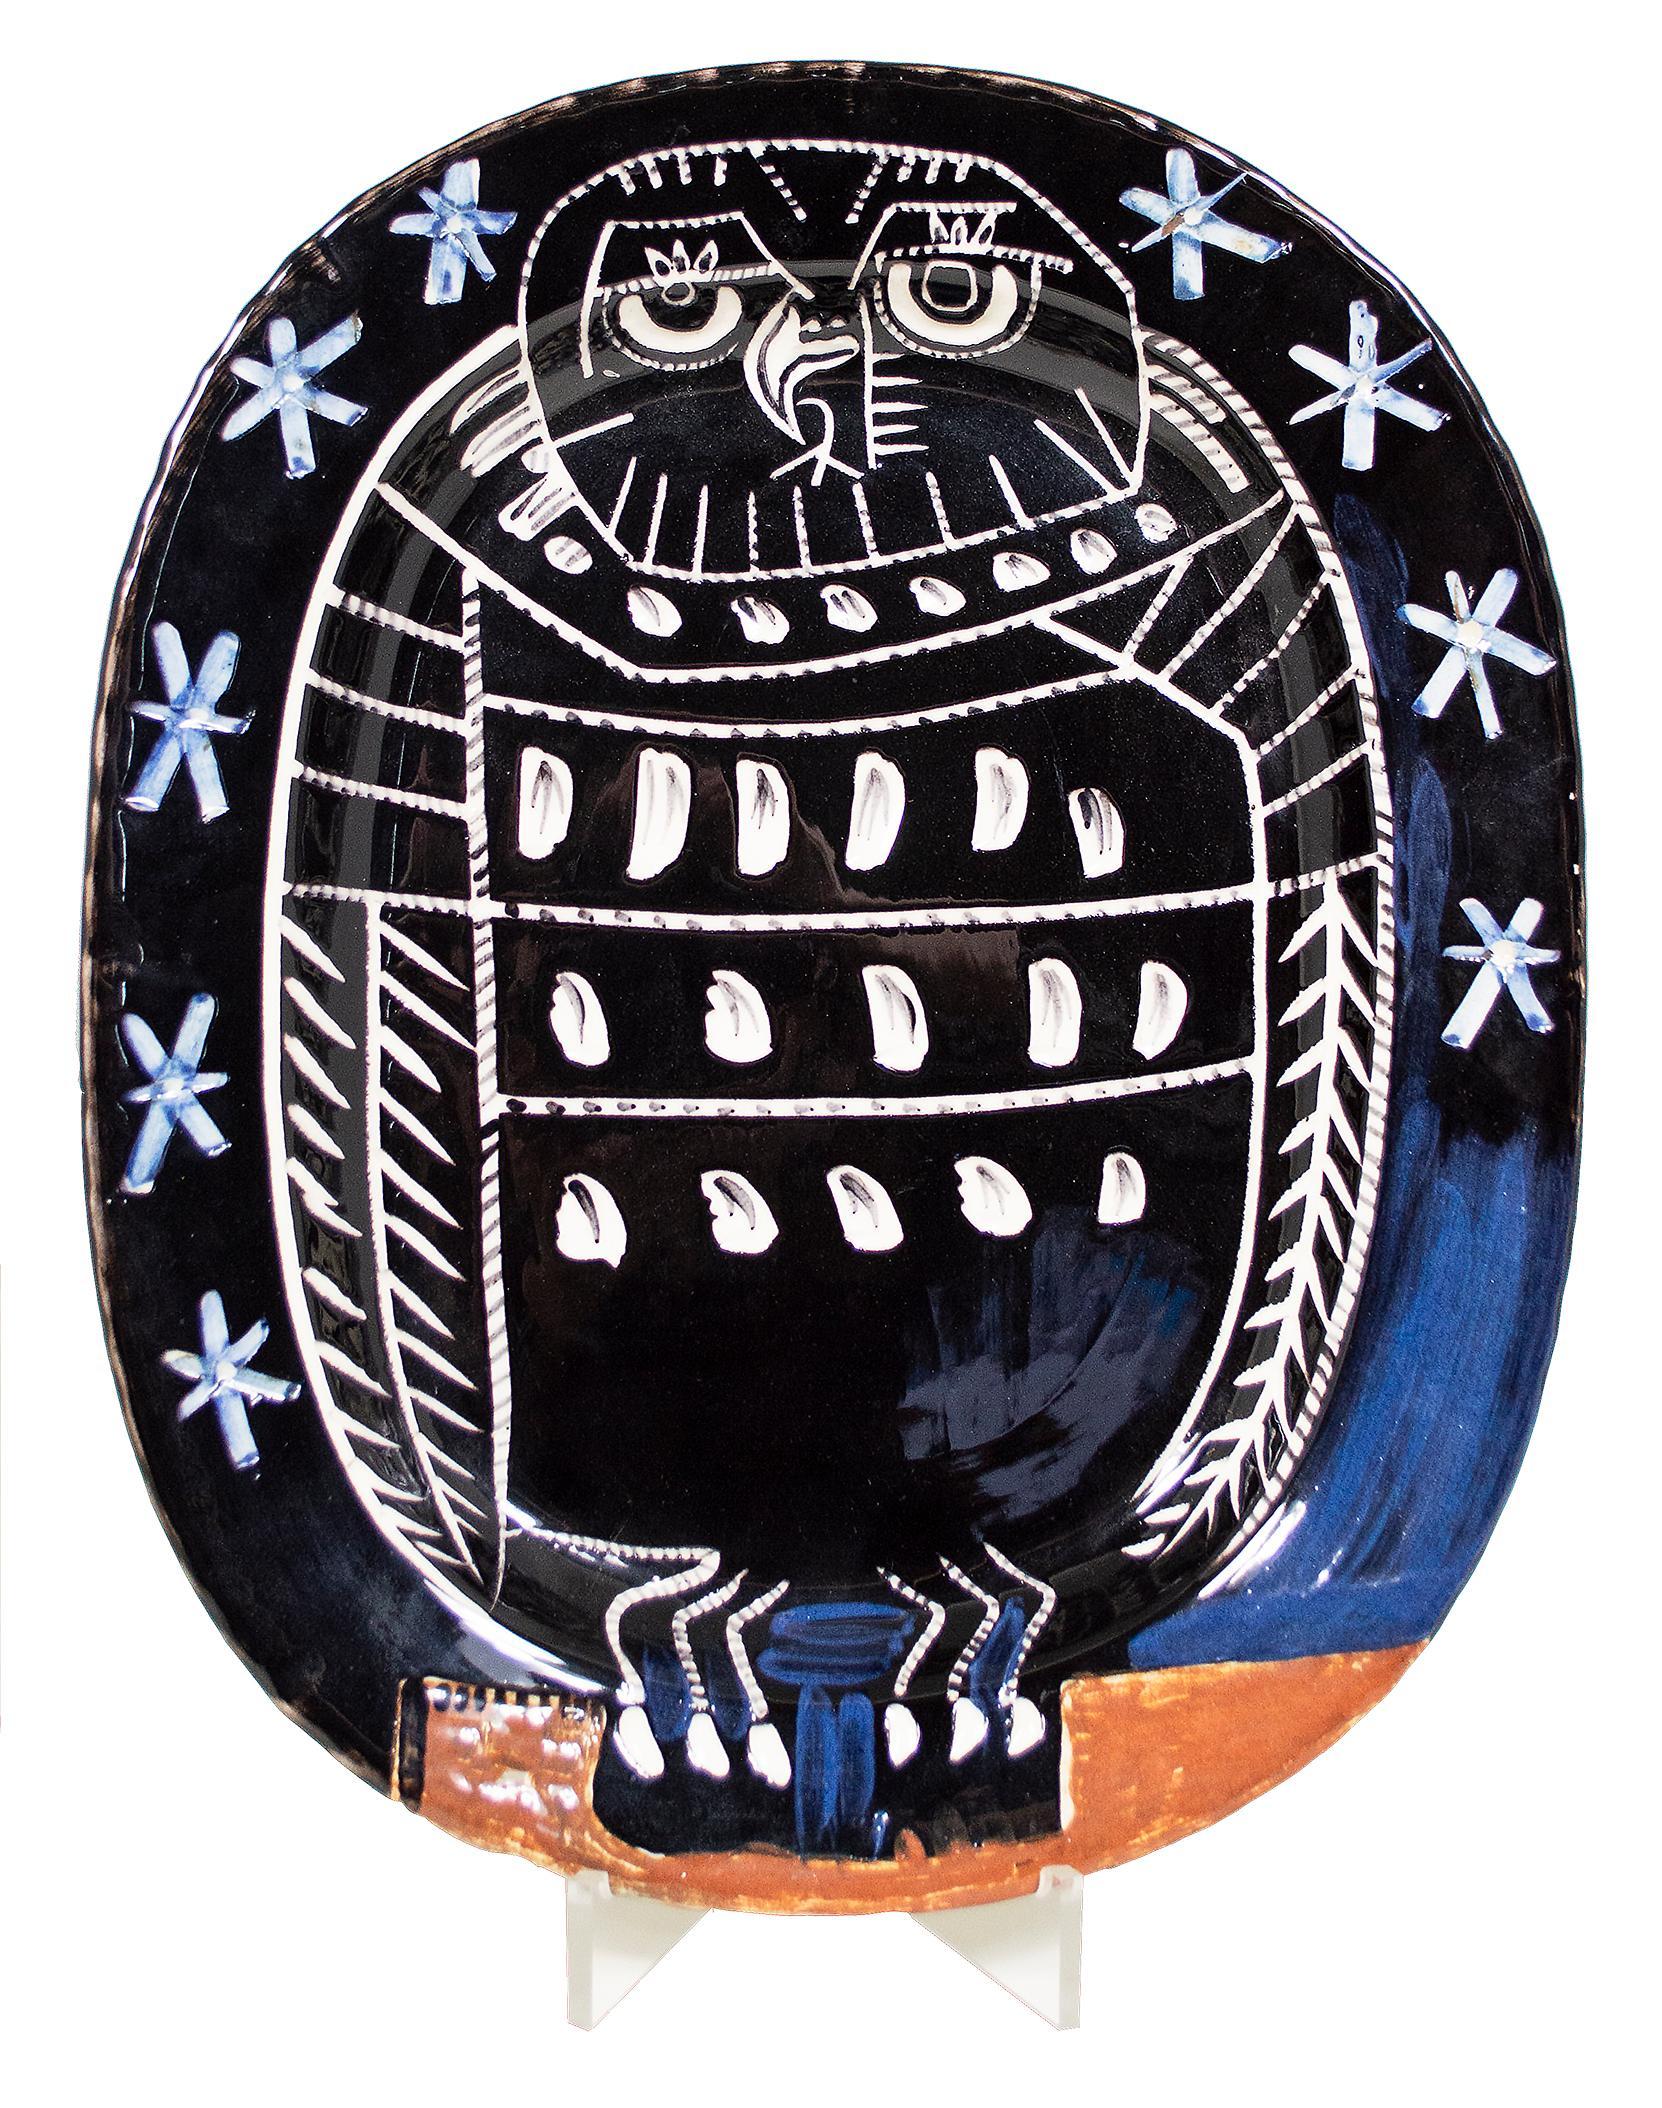 'Bright Owl' original Madoura ceramic rectangular platter, Edition Picasso